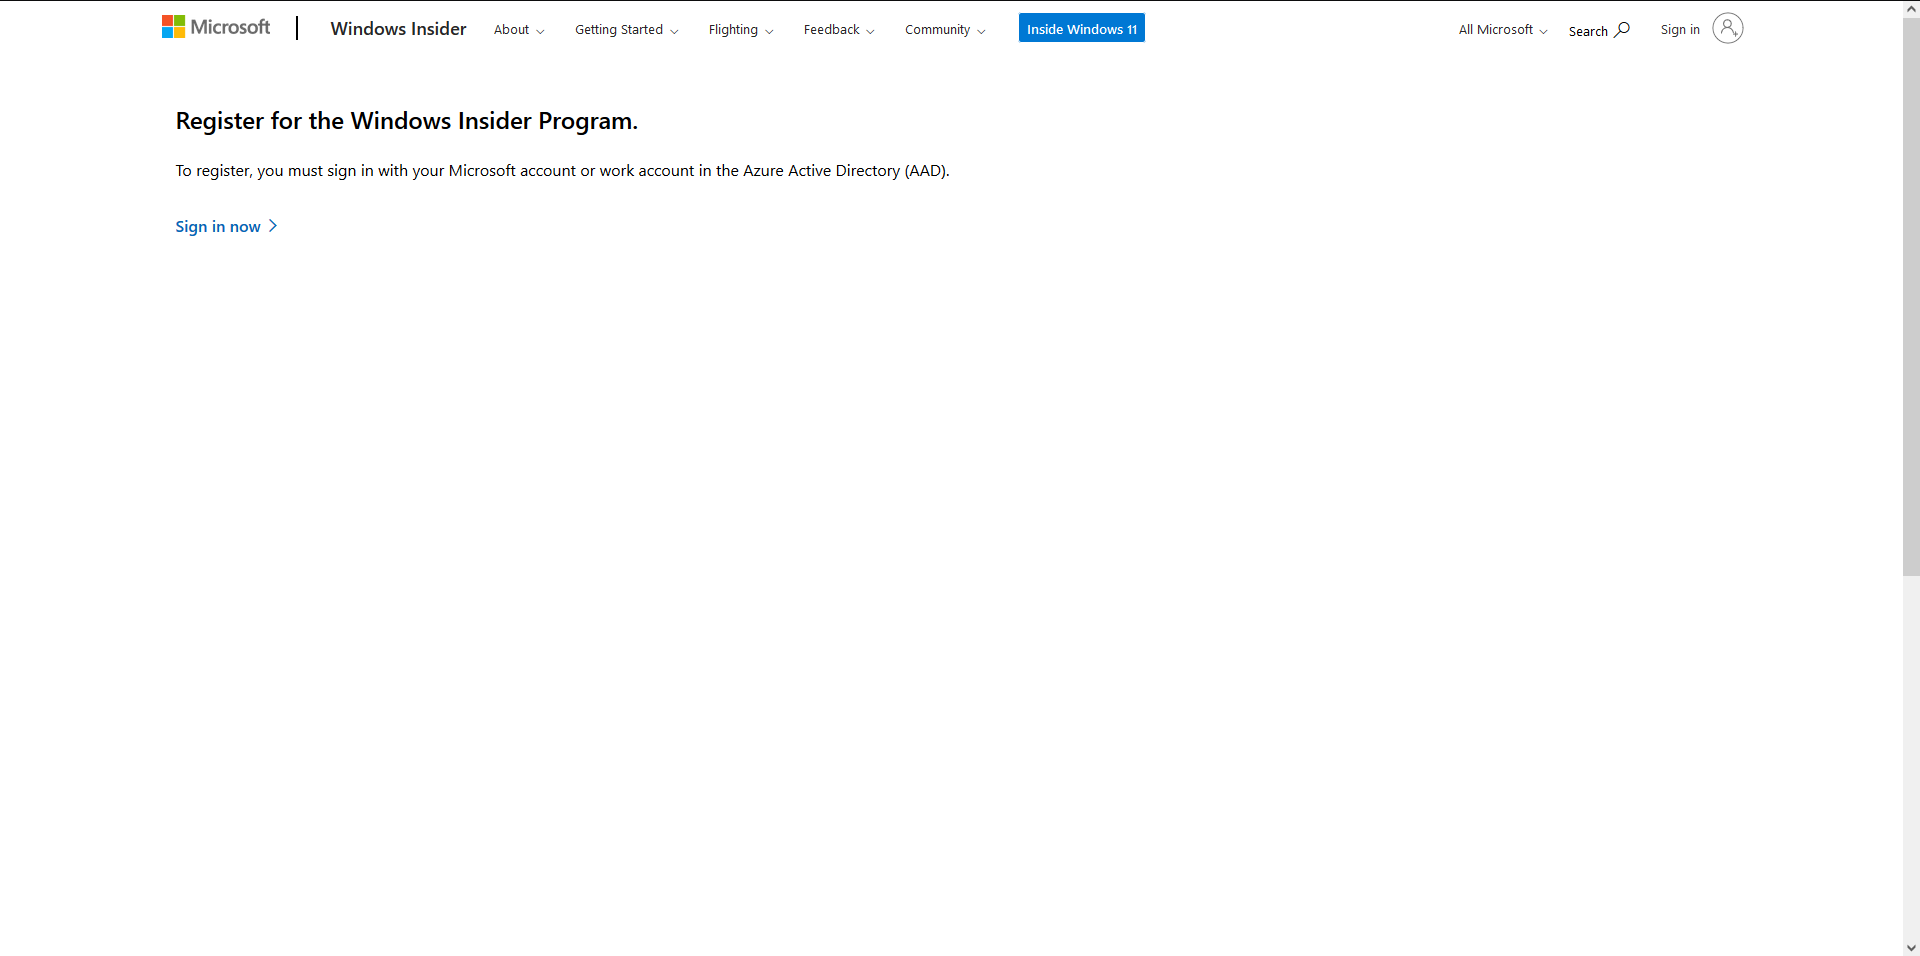 Step 1 for registering windows insider program for downloading windows 11 preview